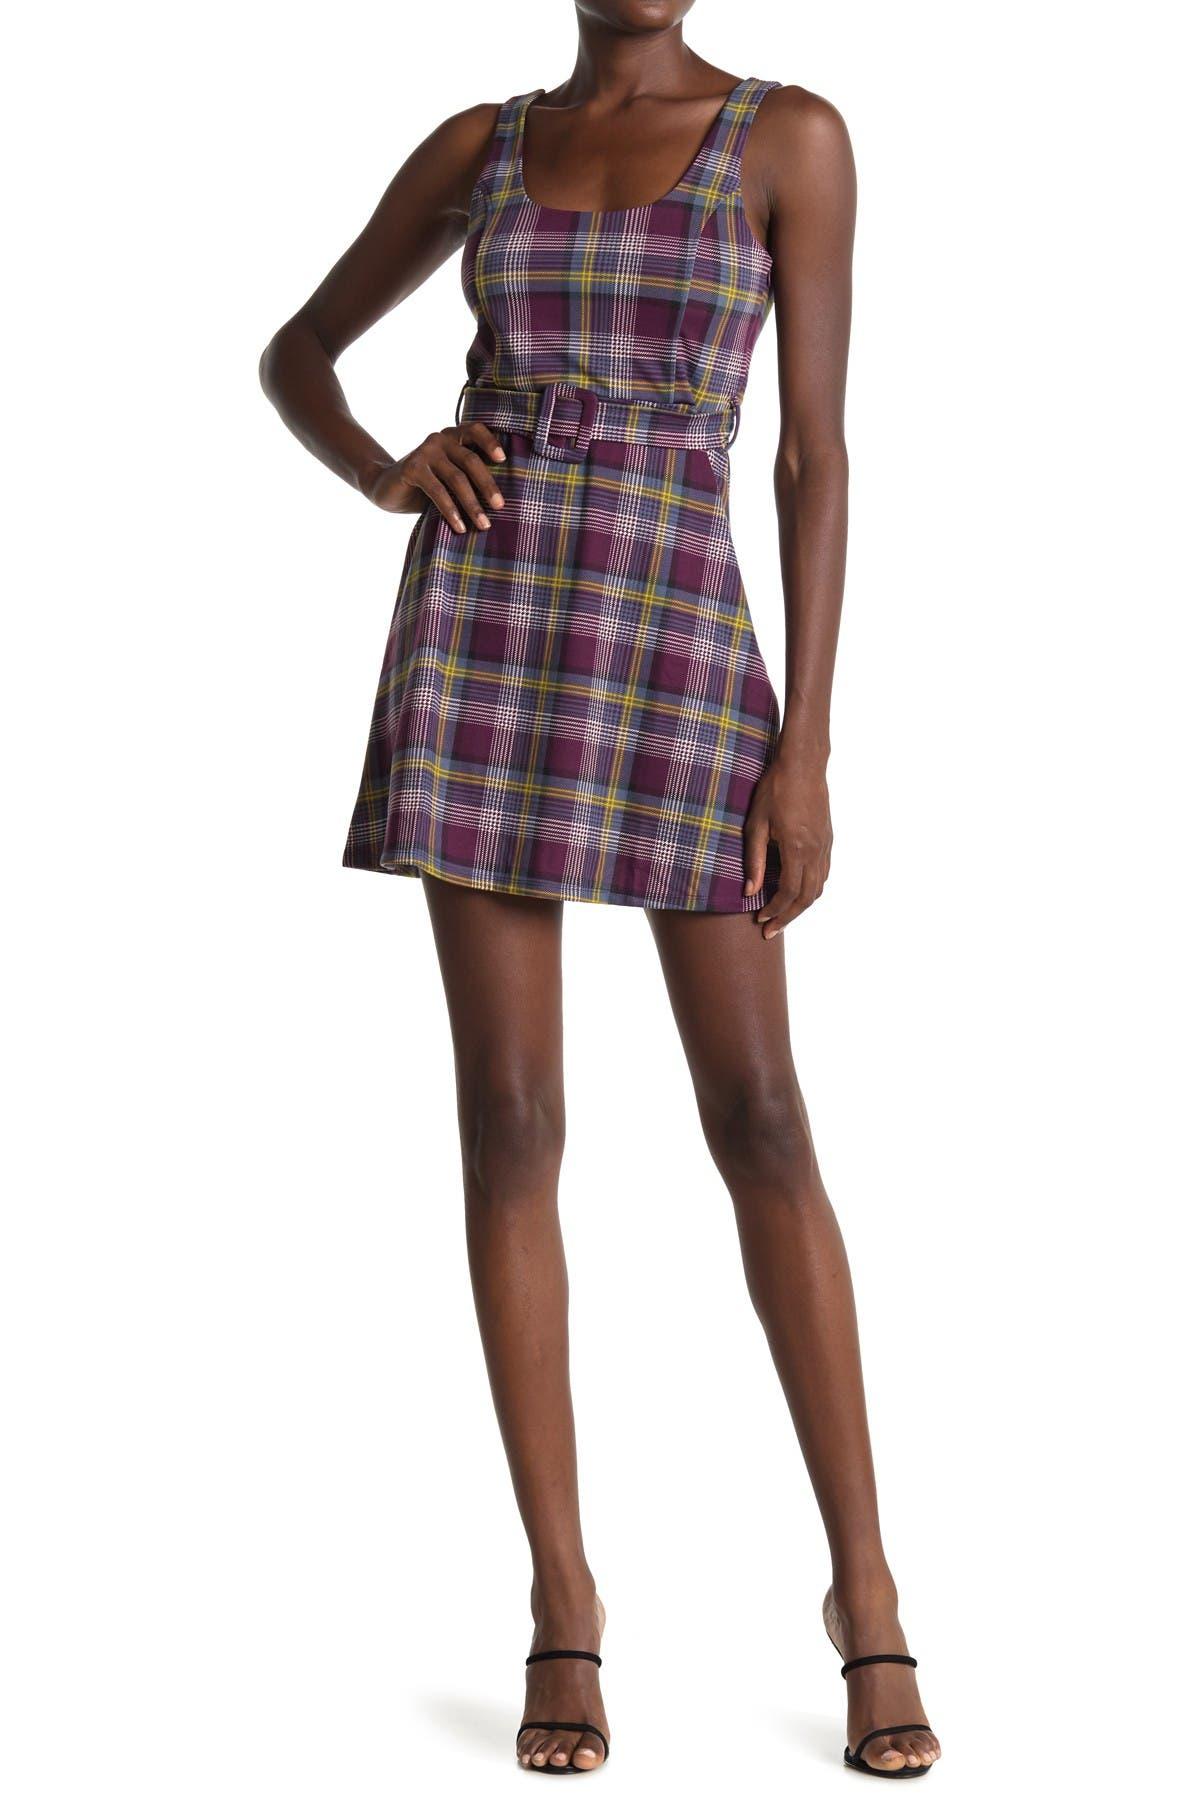 Image of PLANET GOLD Plaid Sleeveless Belted Mini Dress